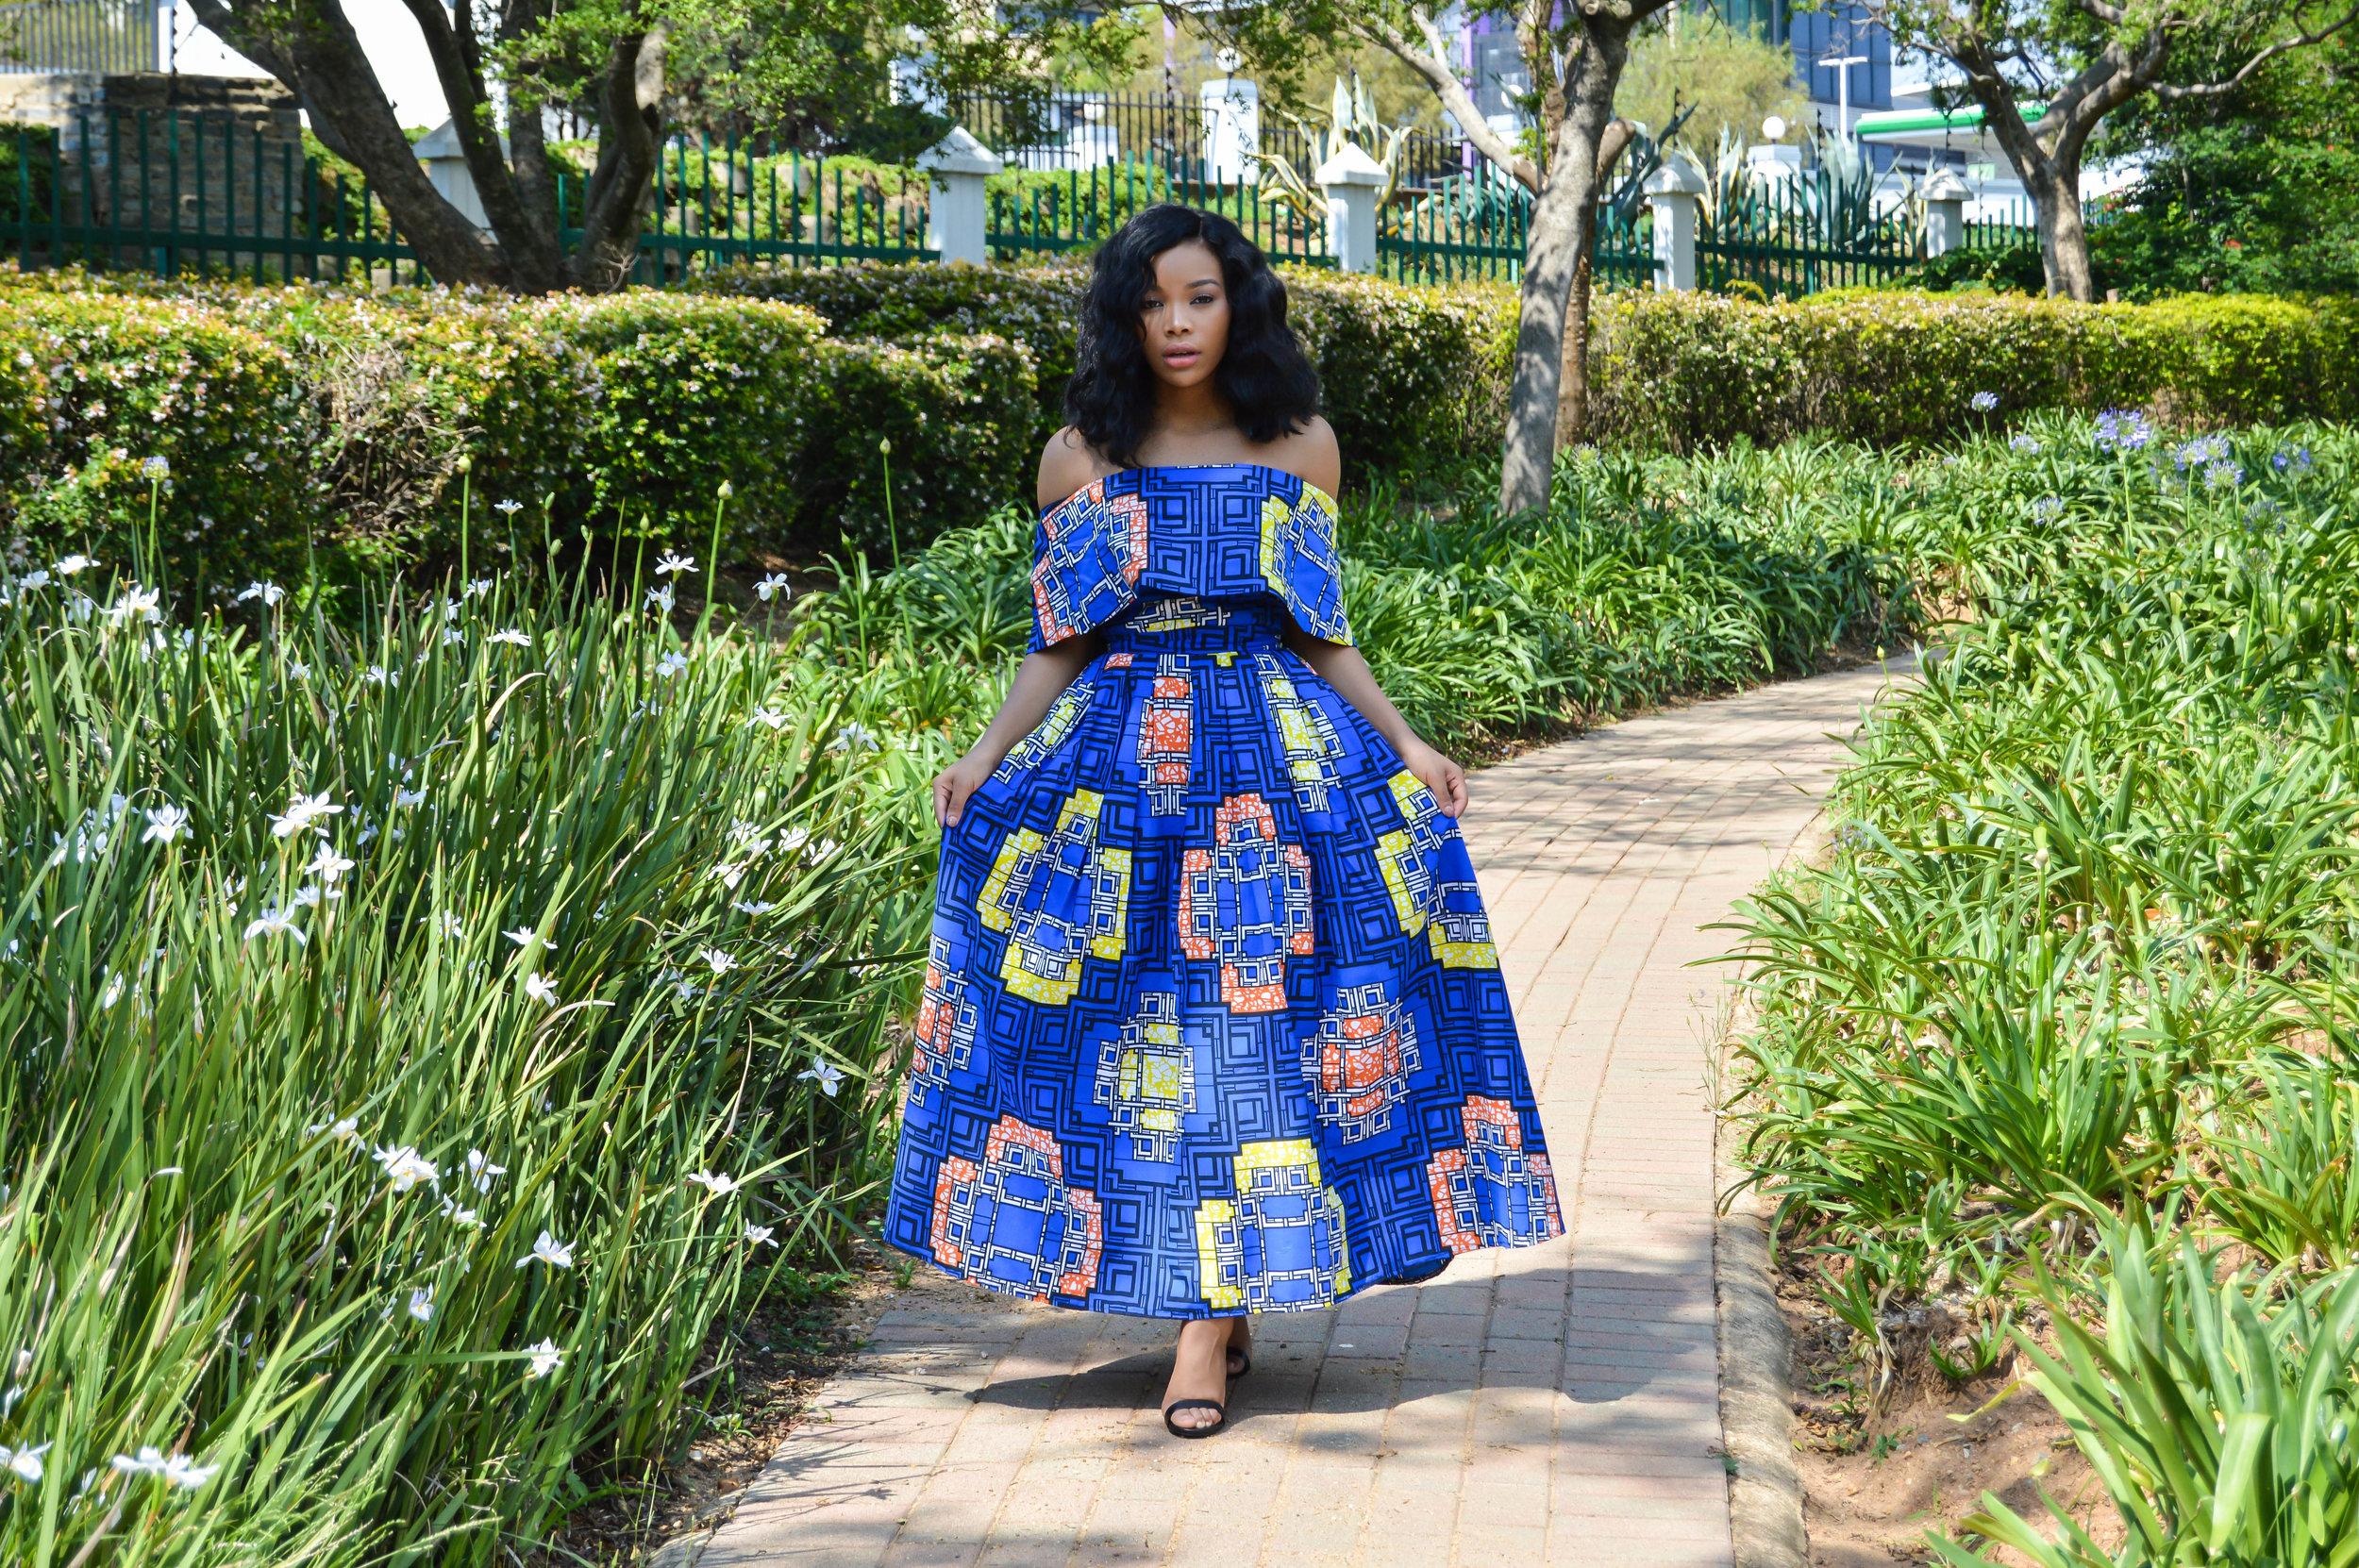 c94d4ff38b5 DRESS KODE: AFRICAN INSPIRED (X-MAS PARTY EDITION) — Kaylista